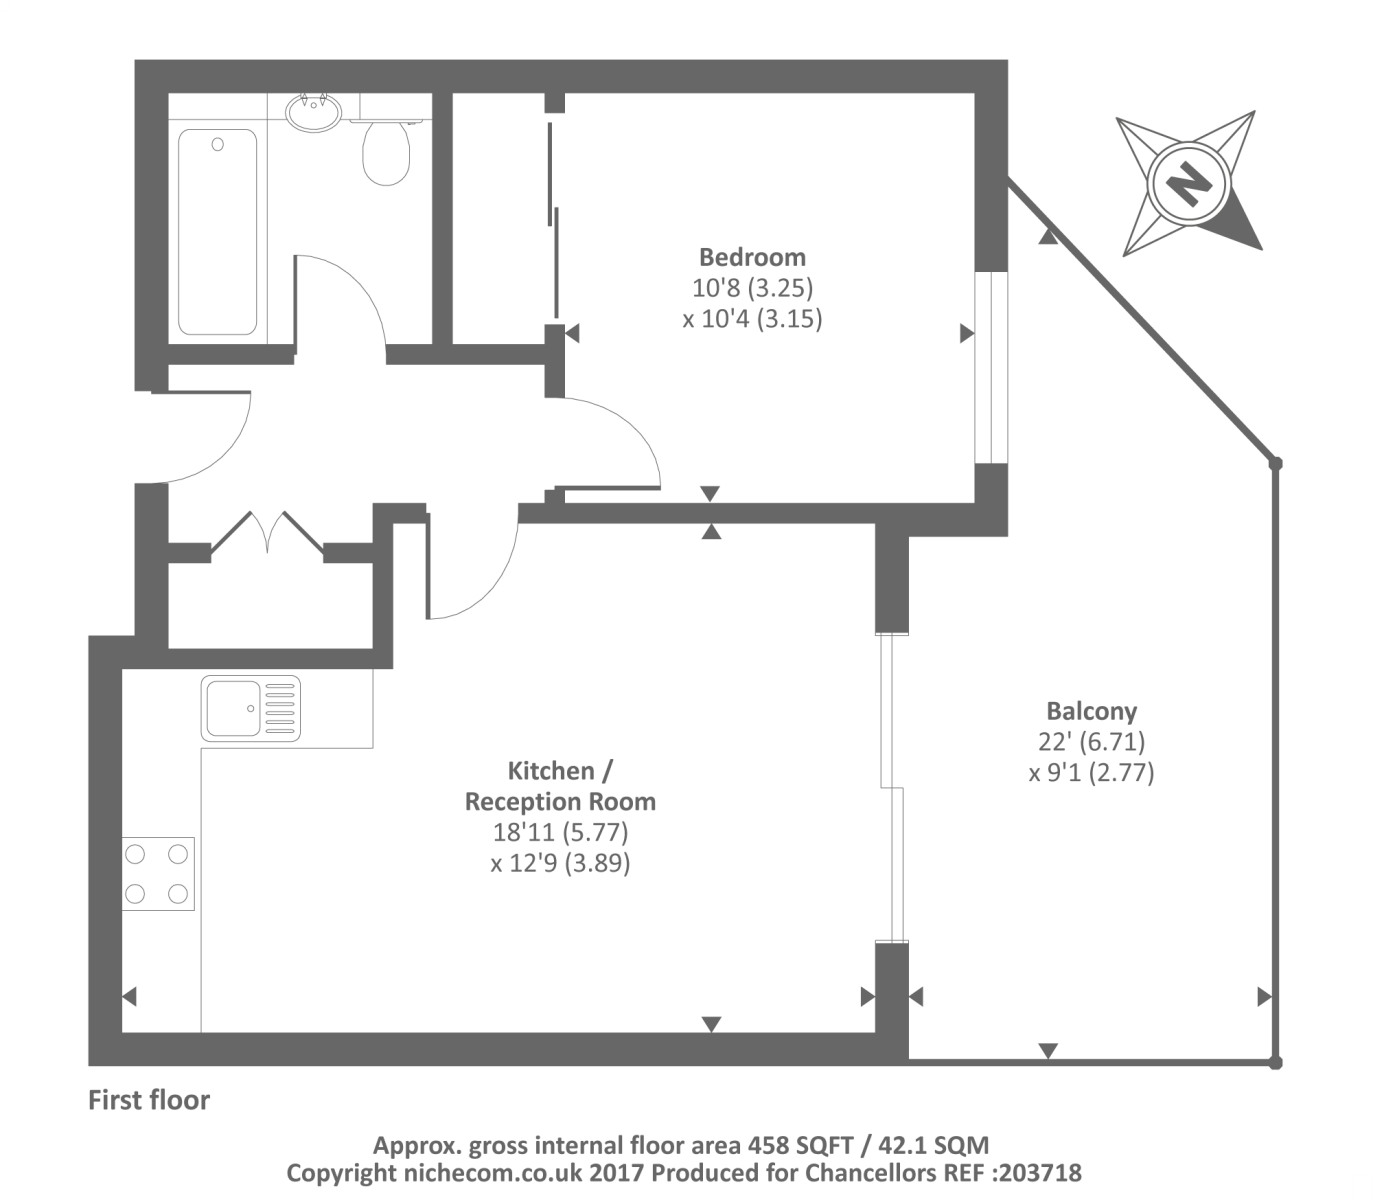 Nightingale House Kennet Island